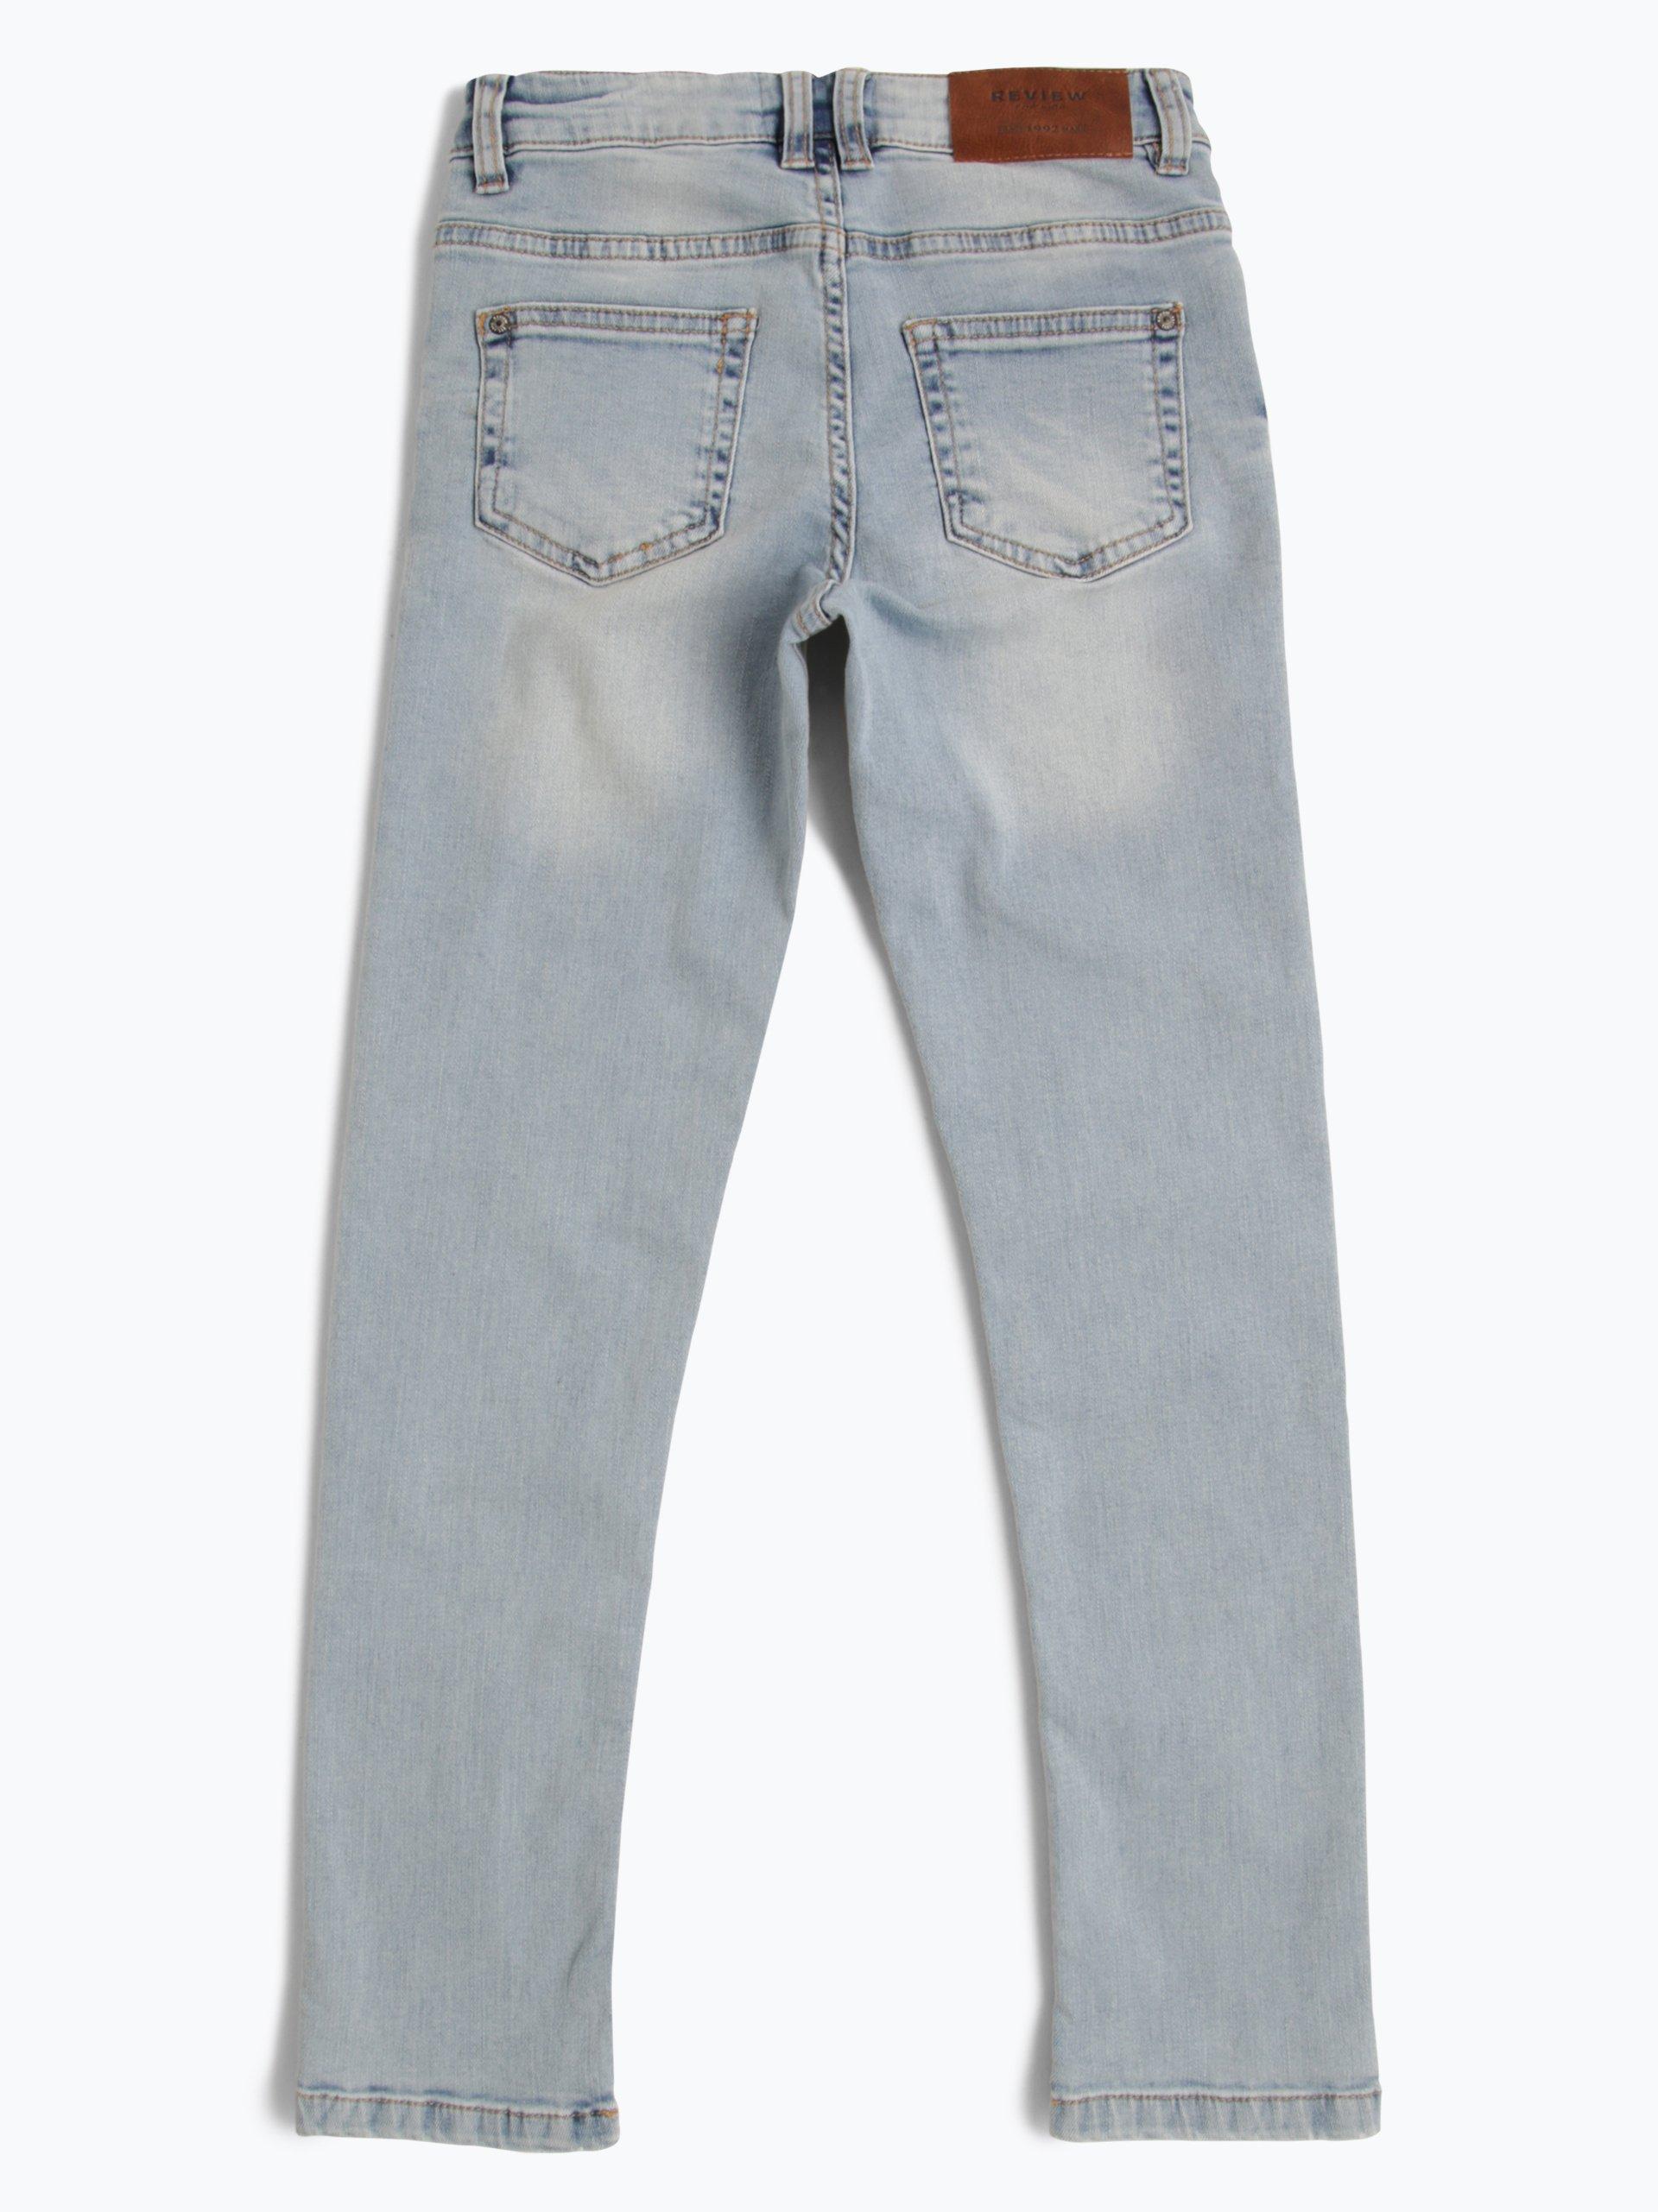 Review Jungen Jeans - Slim Fit